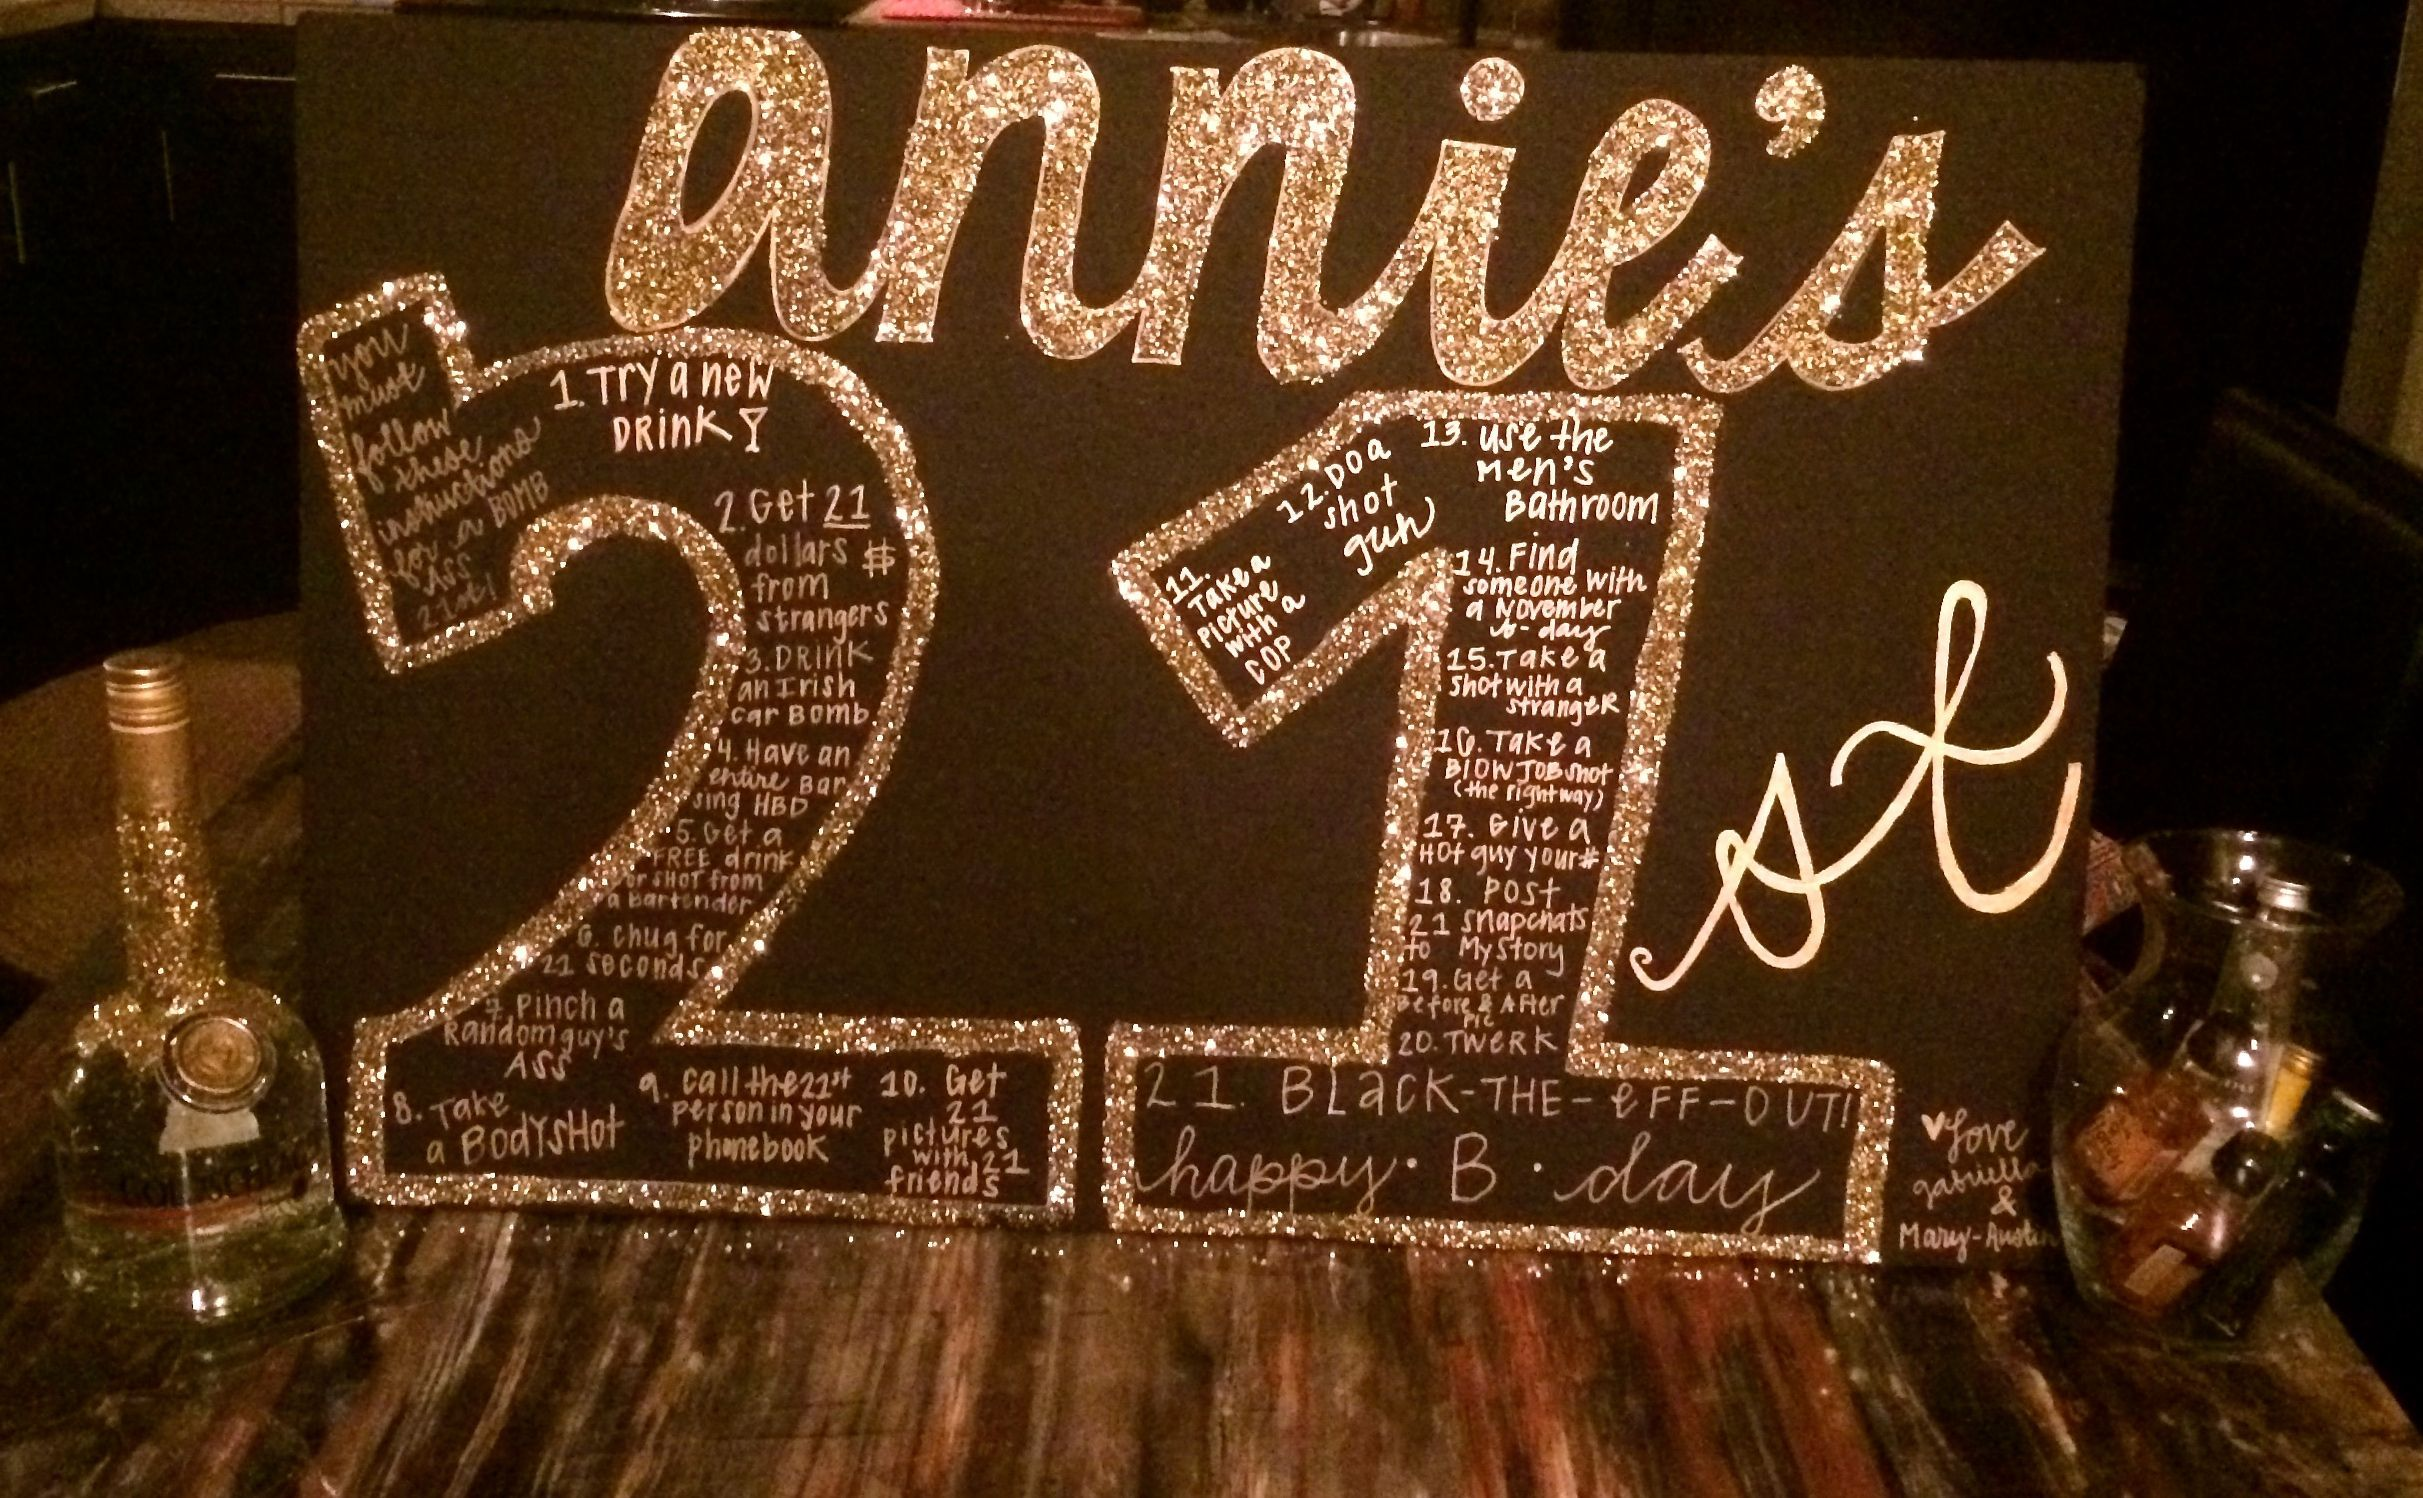 #glitterlots #celebrate #sharpies #birthday #modpodge #glitter #friend #poster #board #black #close #craft #gold #lots #sign21st Birthday Sign! black poster board, gold sharpies, modpodge, and GLITTER...lots and lots of gold glitter! An easy craft to celebrate a 21st birthday for a close friend. #21stbirthdaysigns